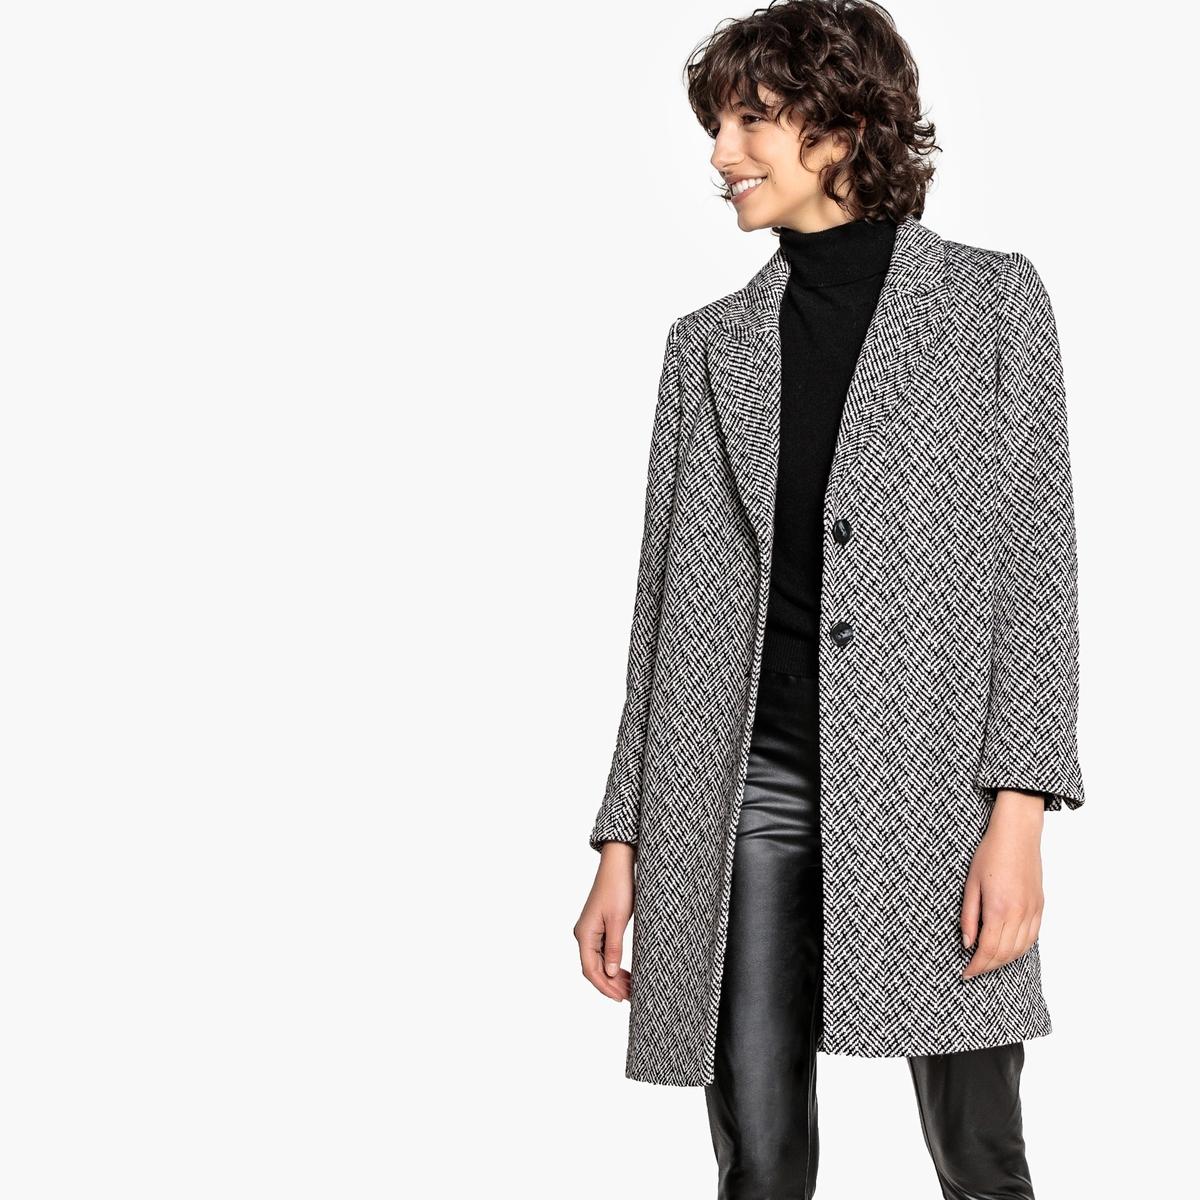 Abrigo corto estilo espiga, de lana mezclada